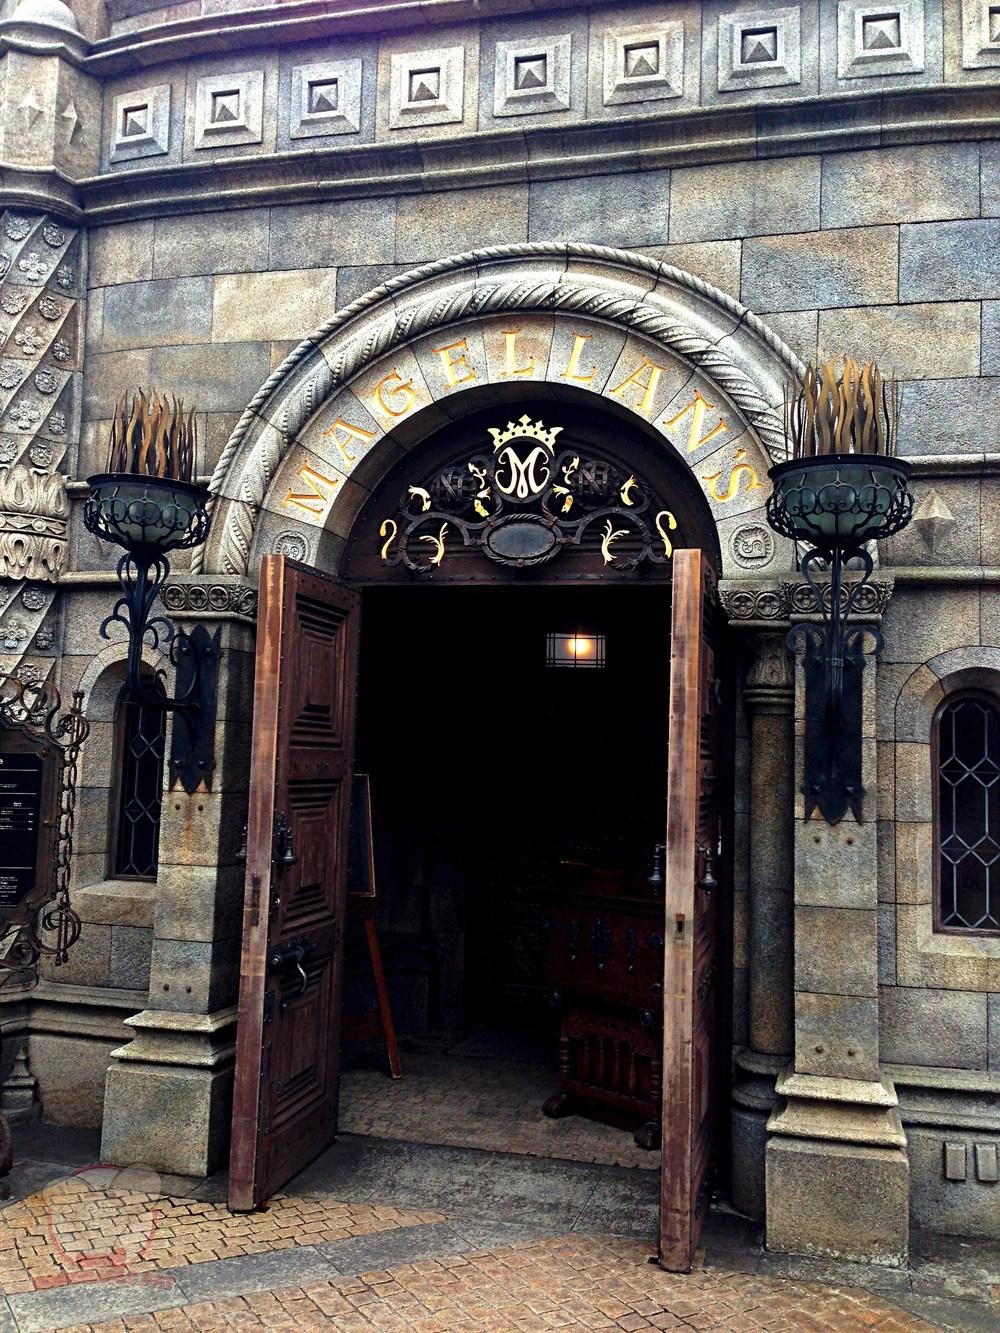 Magellan's in Tokyo Disneysea